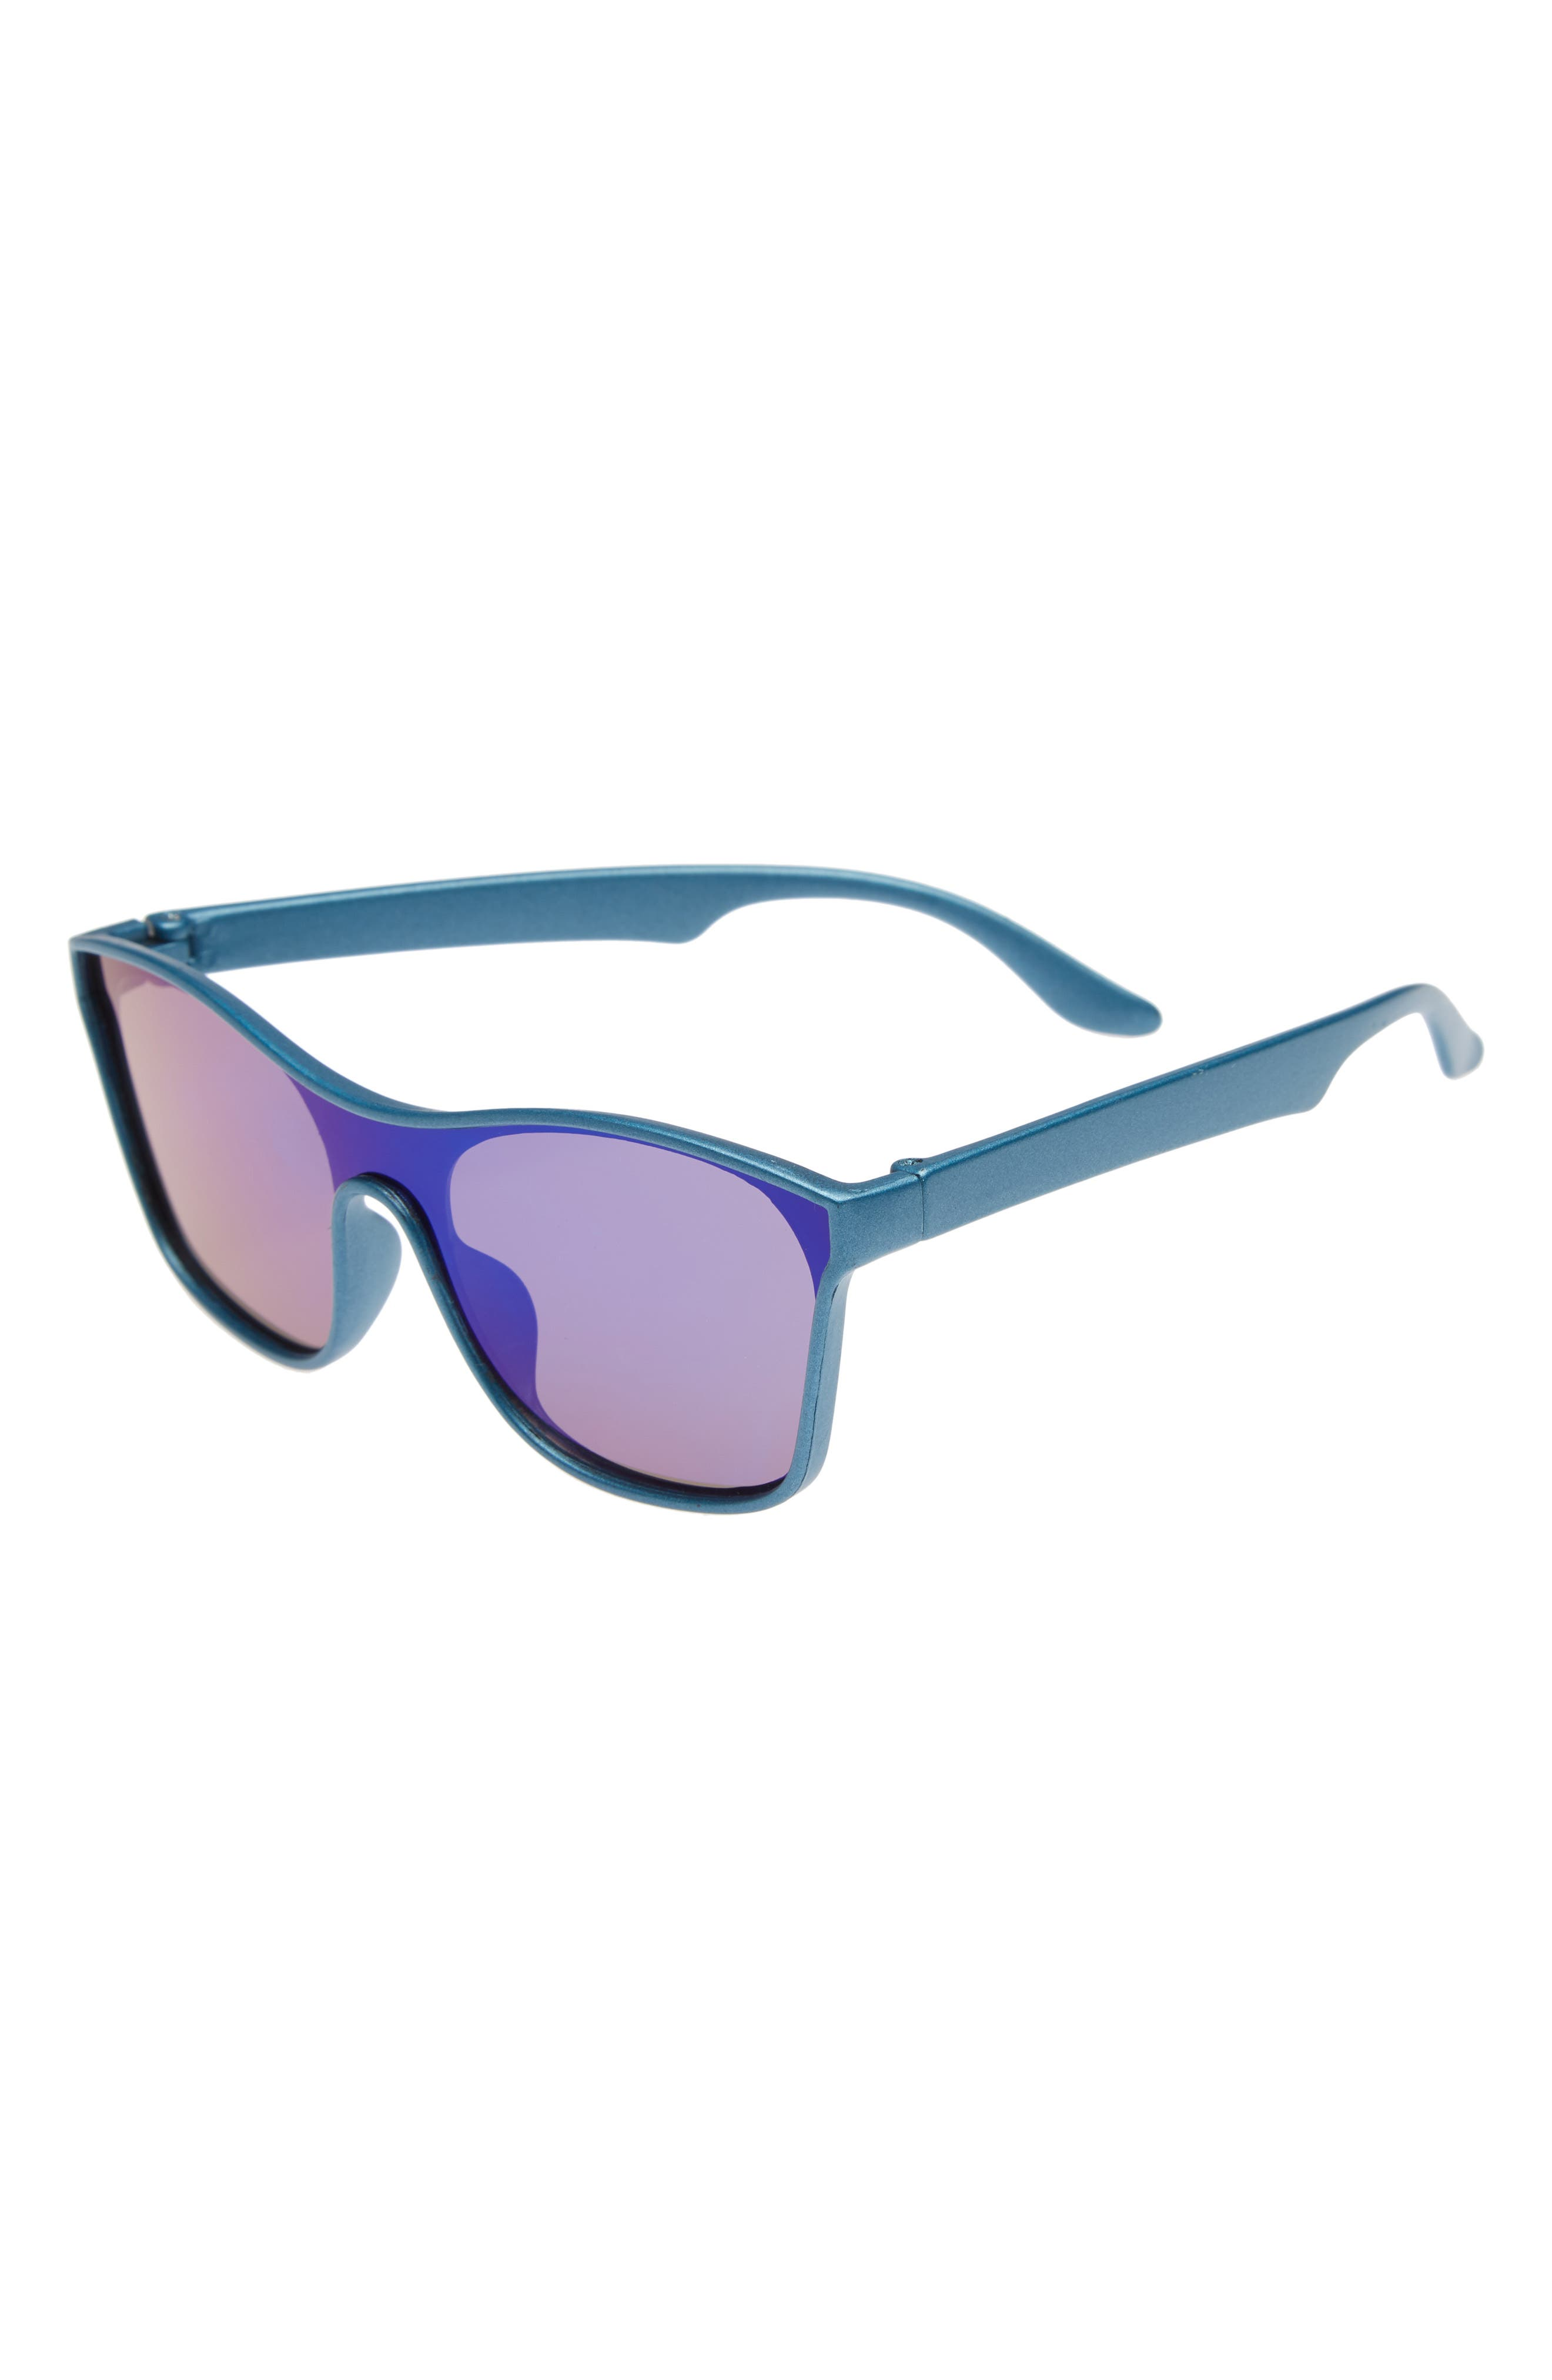 Main Image - Fantas Eyes Mirrored Sunglasses (Boys)